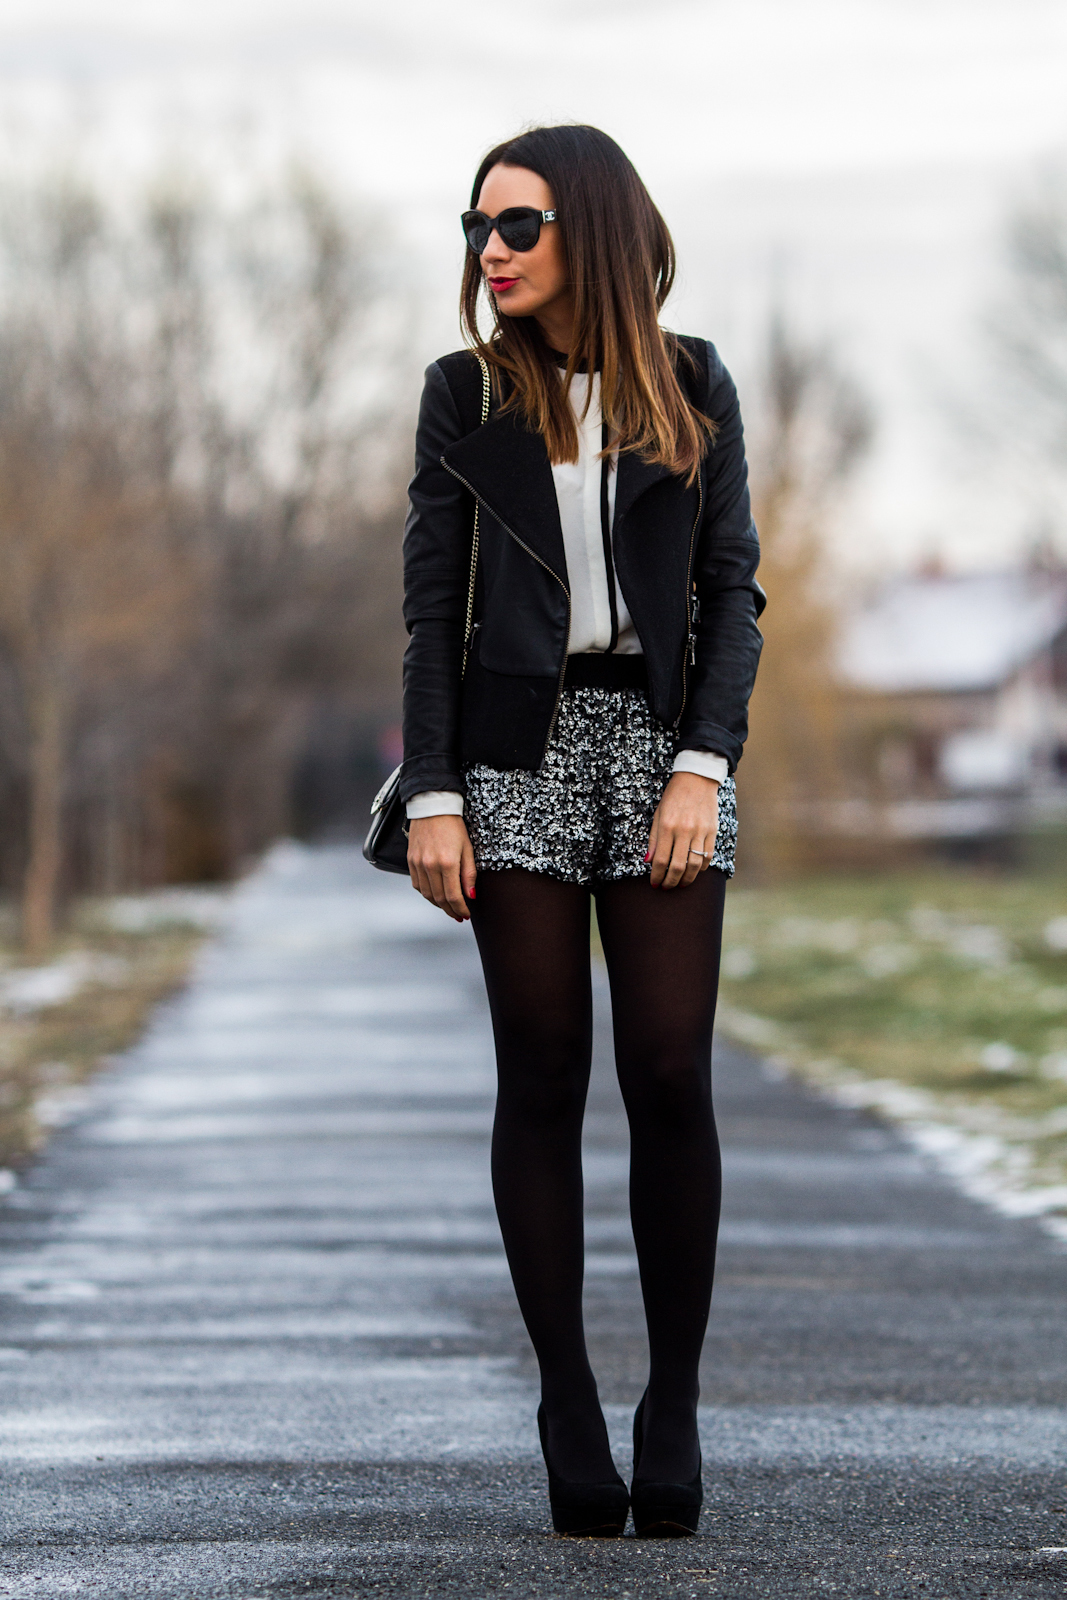 Vestidos manga larga cortos con medias